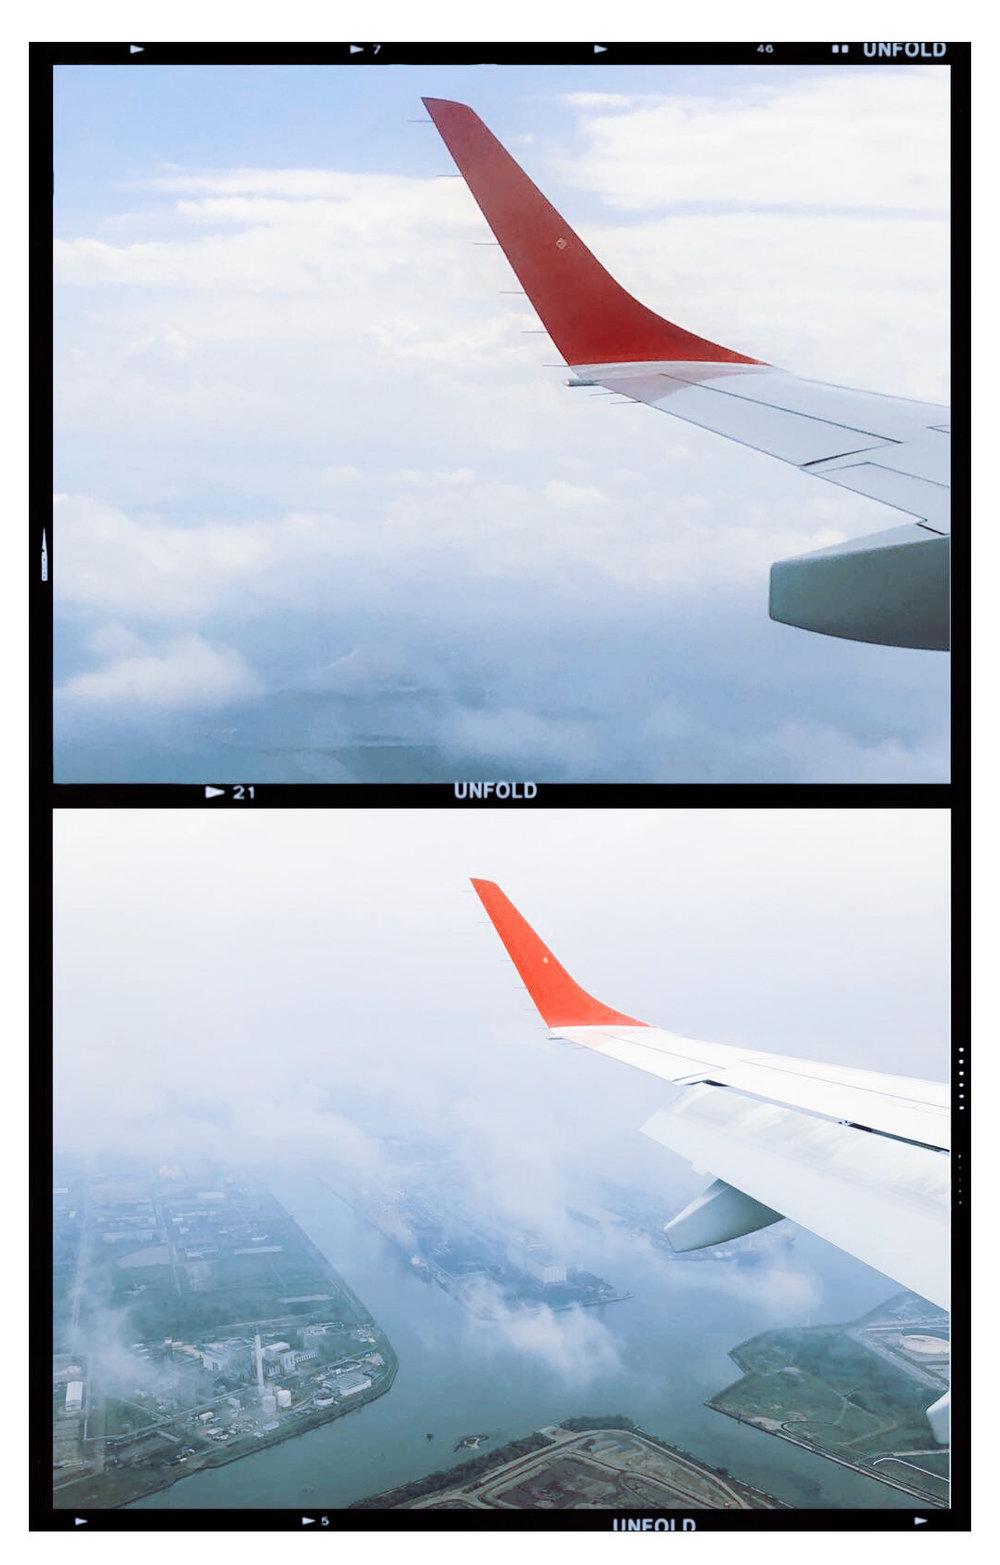 Stylesnooperdan how to get through long haul flight a380.jpg